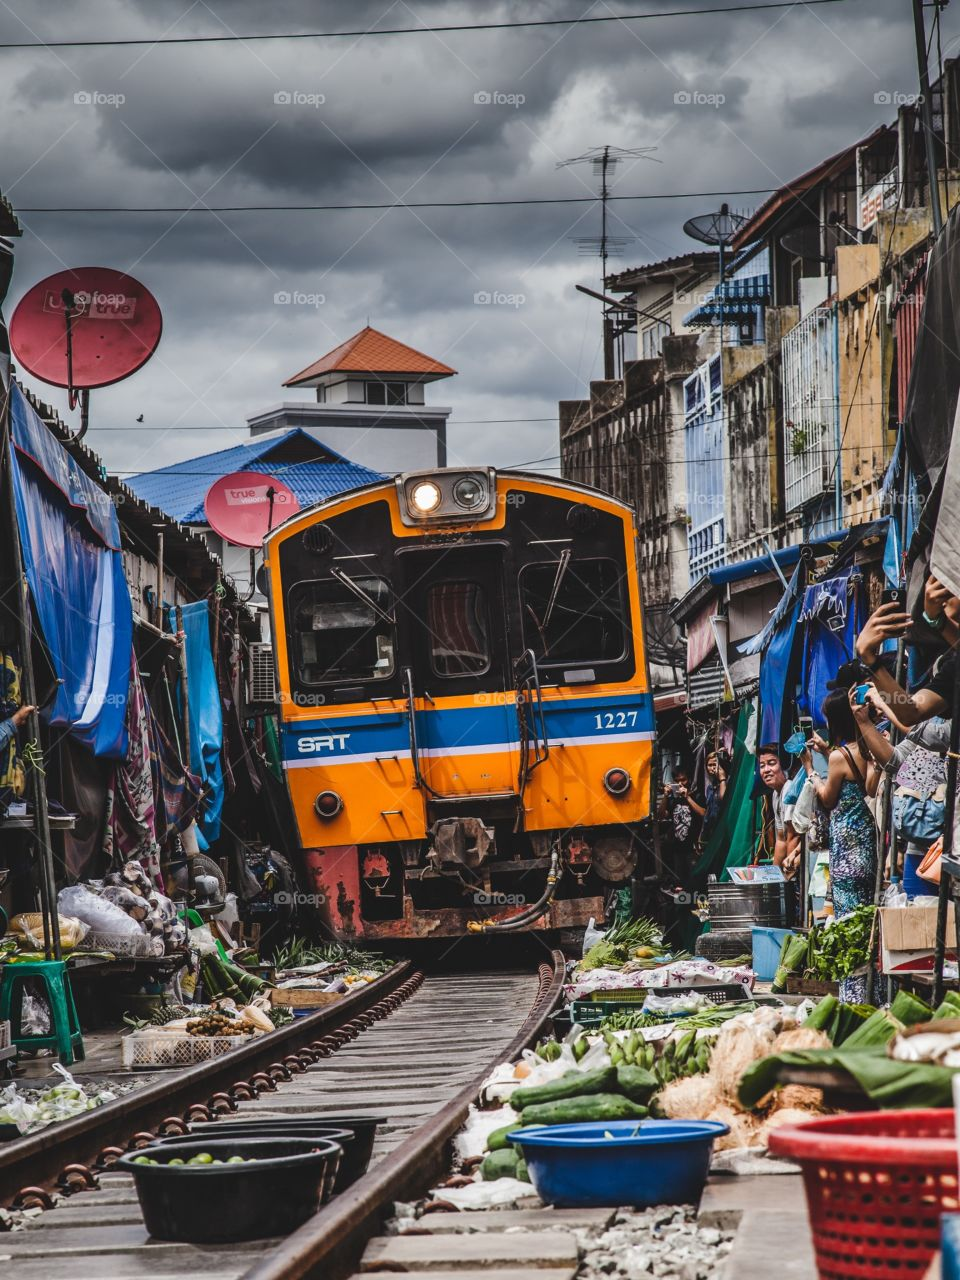 The train through the market